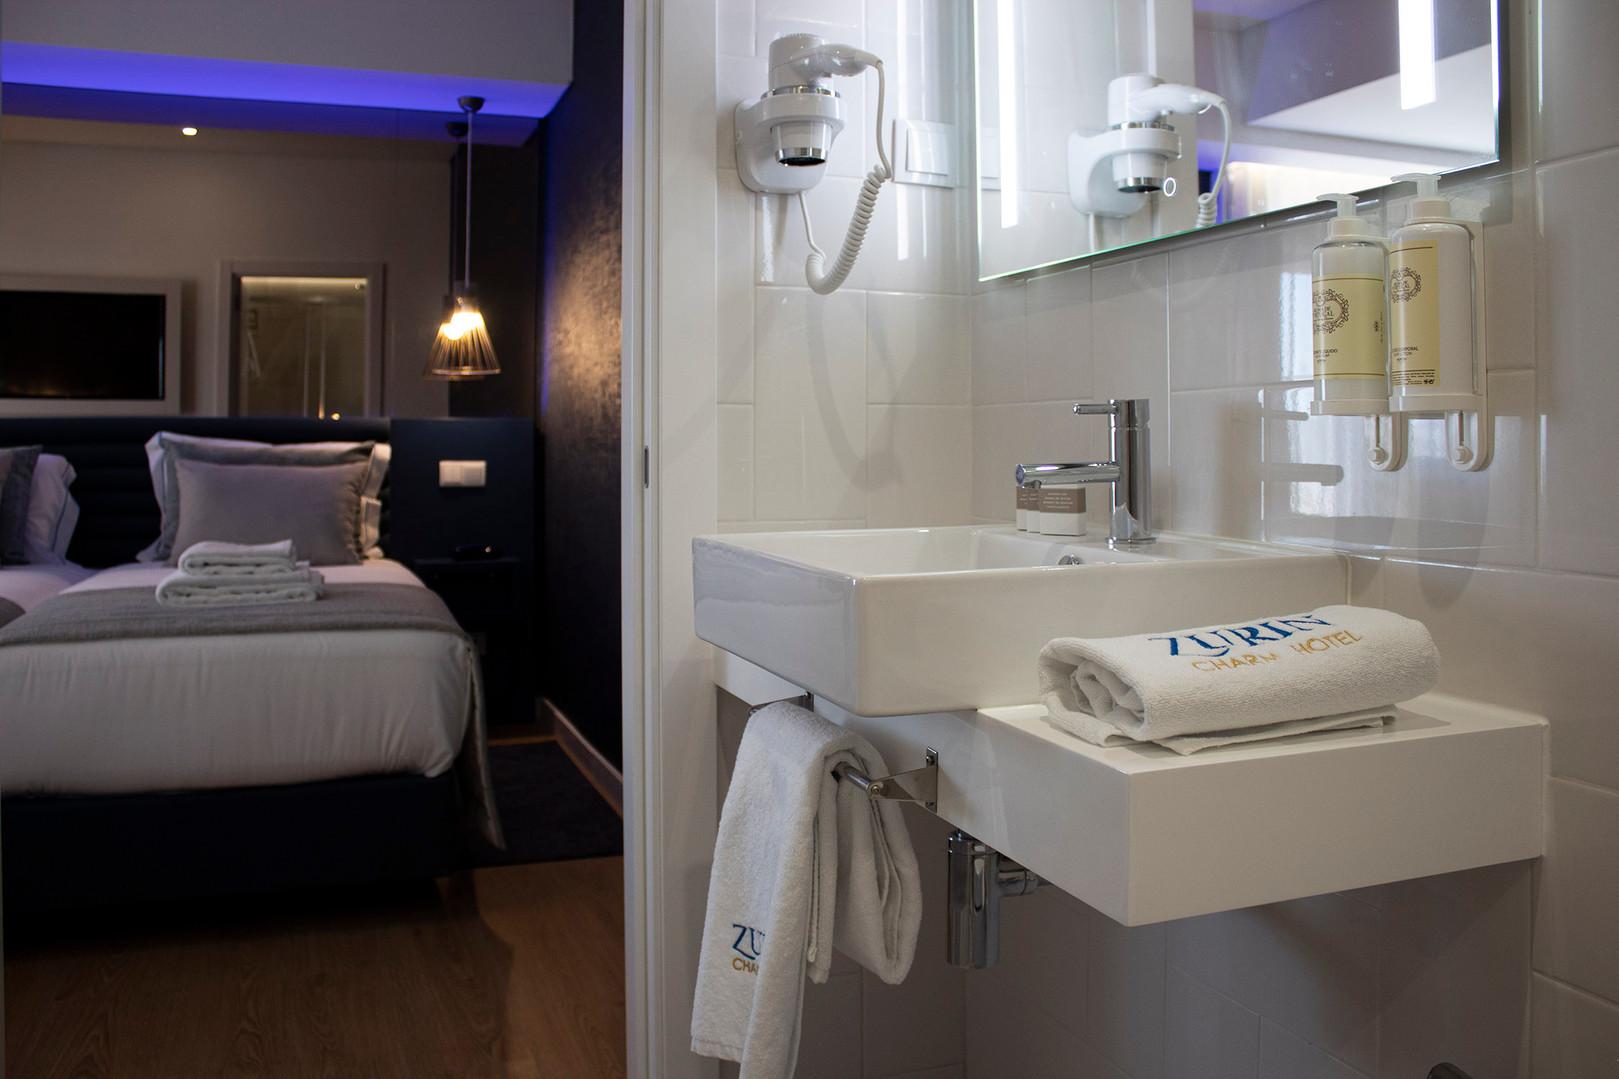 wc quarto hotel 1.jpg